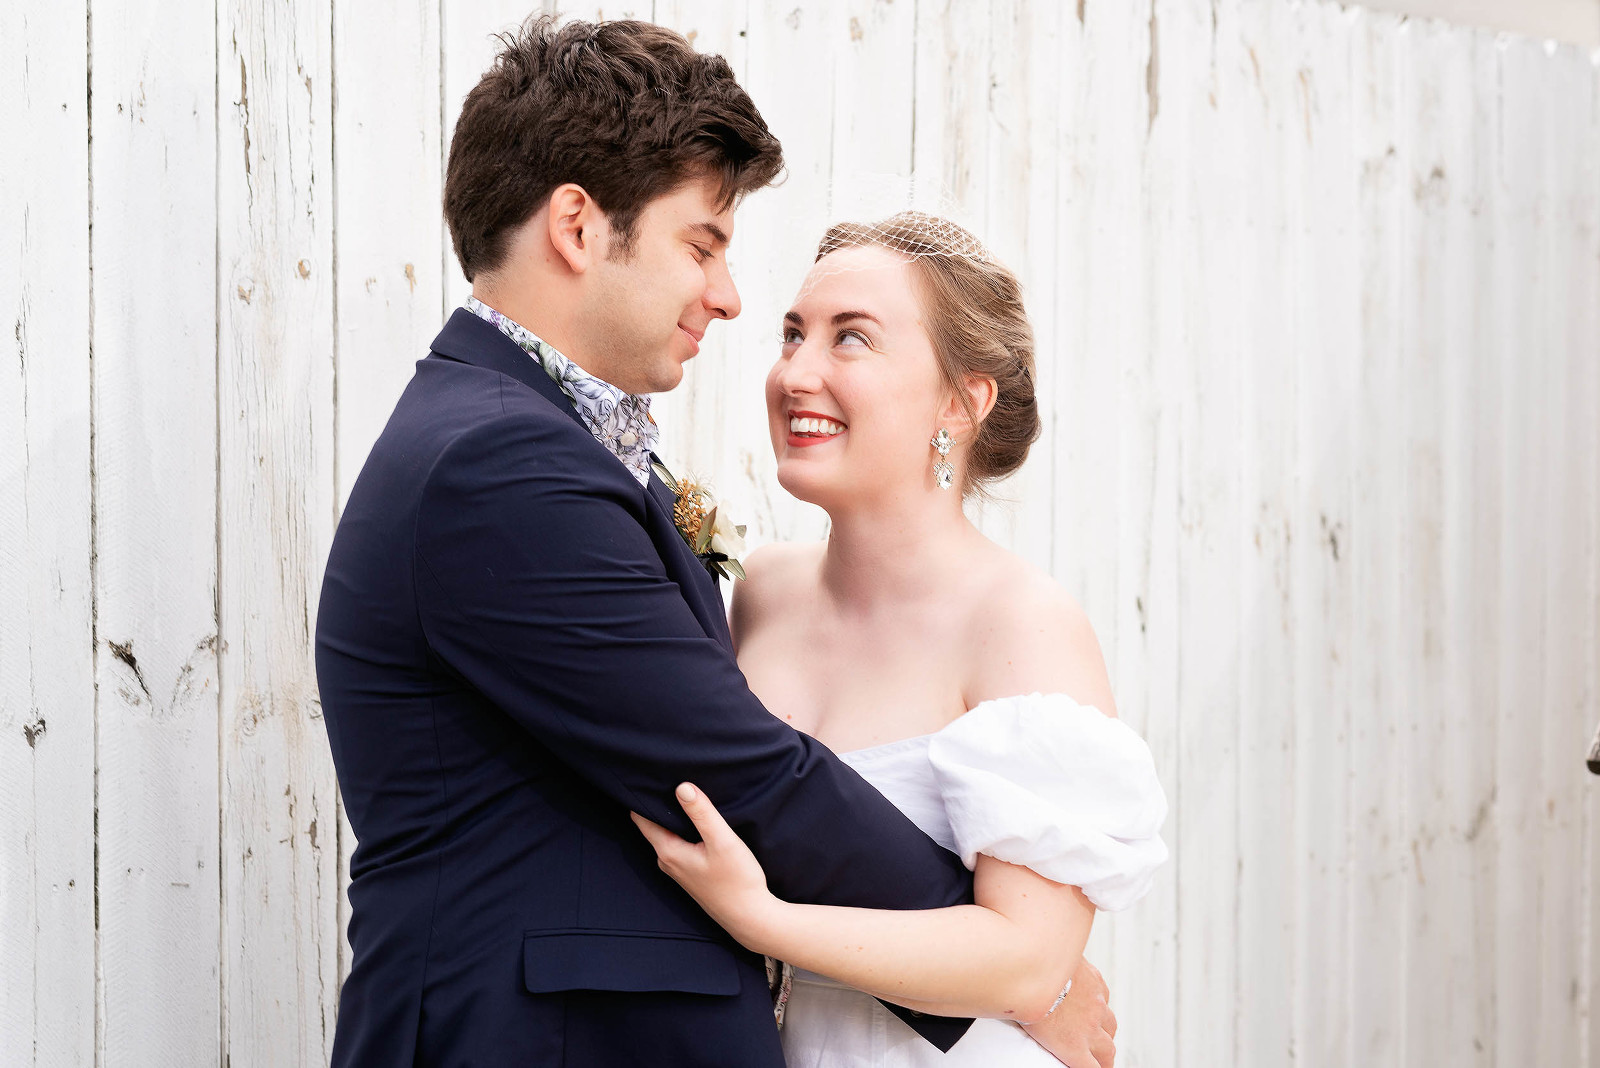 Chicago elopement photographerChicago elopement photographer